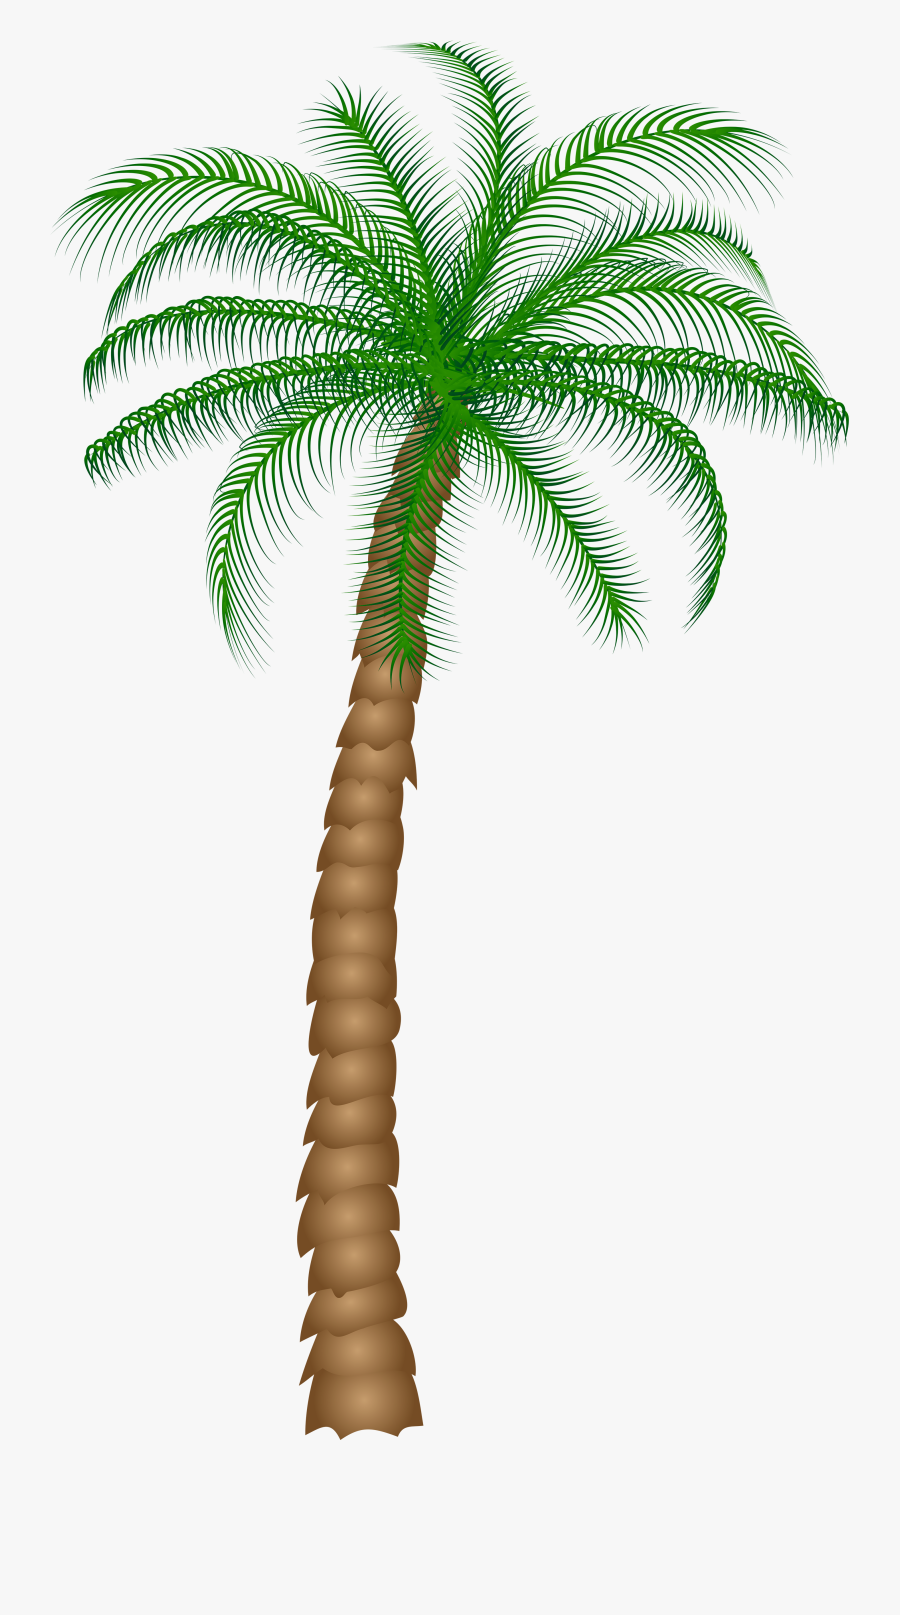 Date Palm Fruit Tree Clipart - Palm Tree Transparent Background, Transparent Clipart